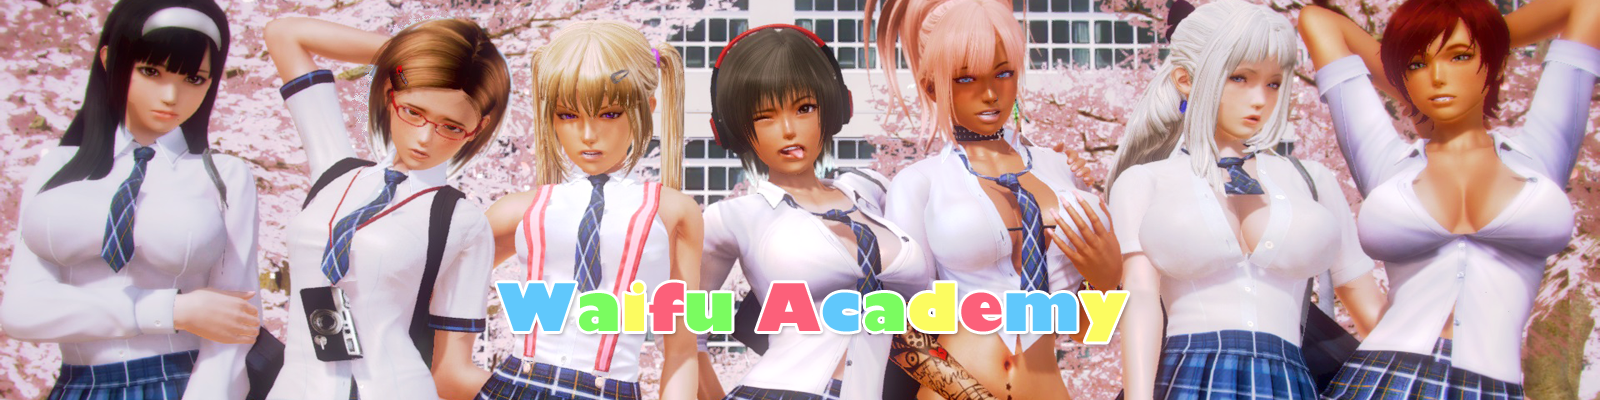 Waifu Academy